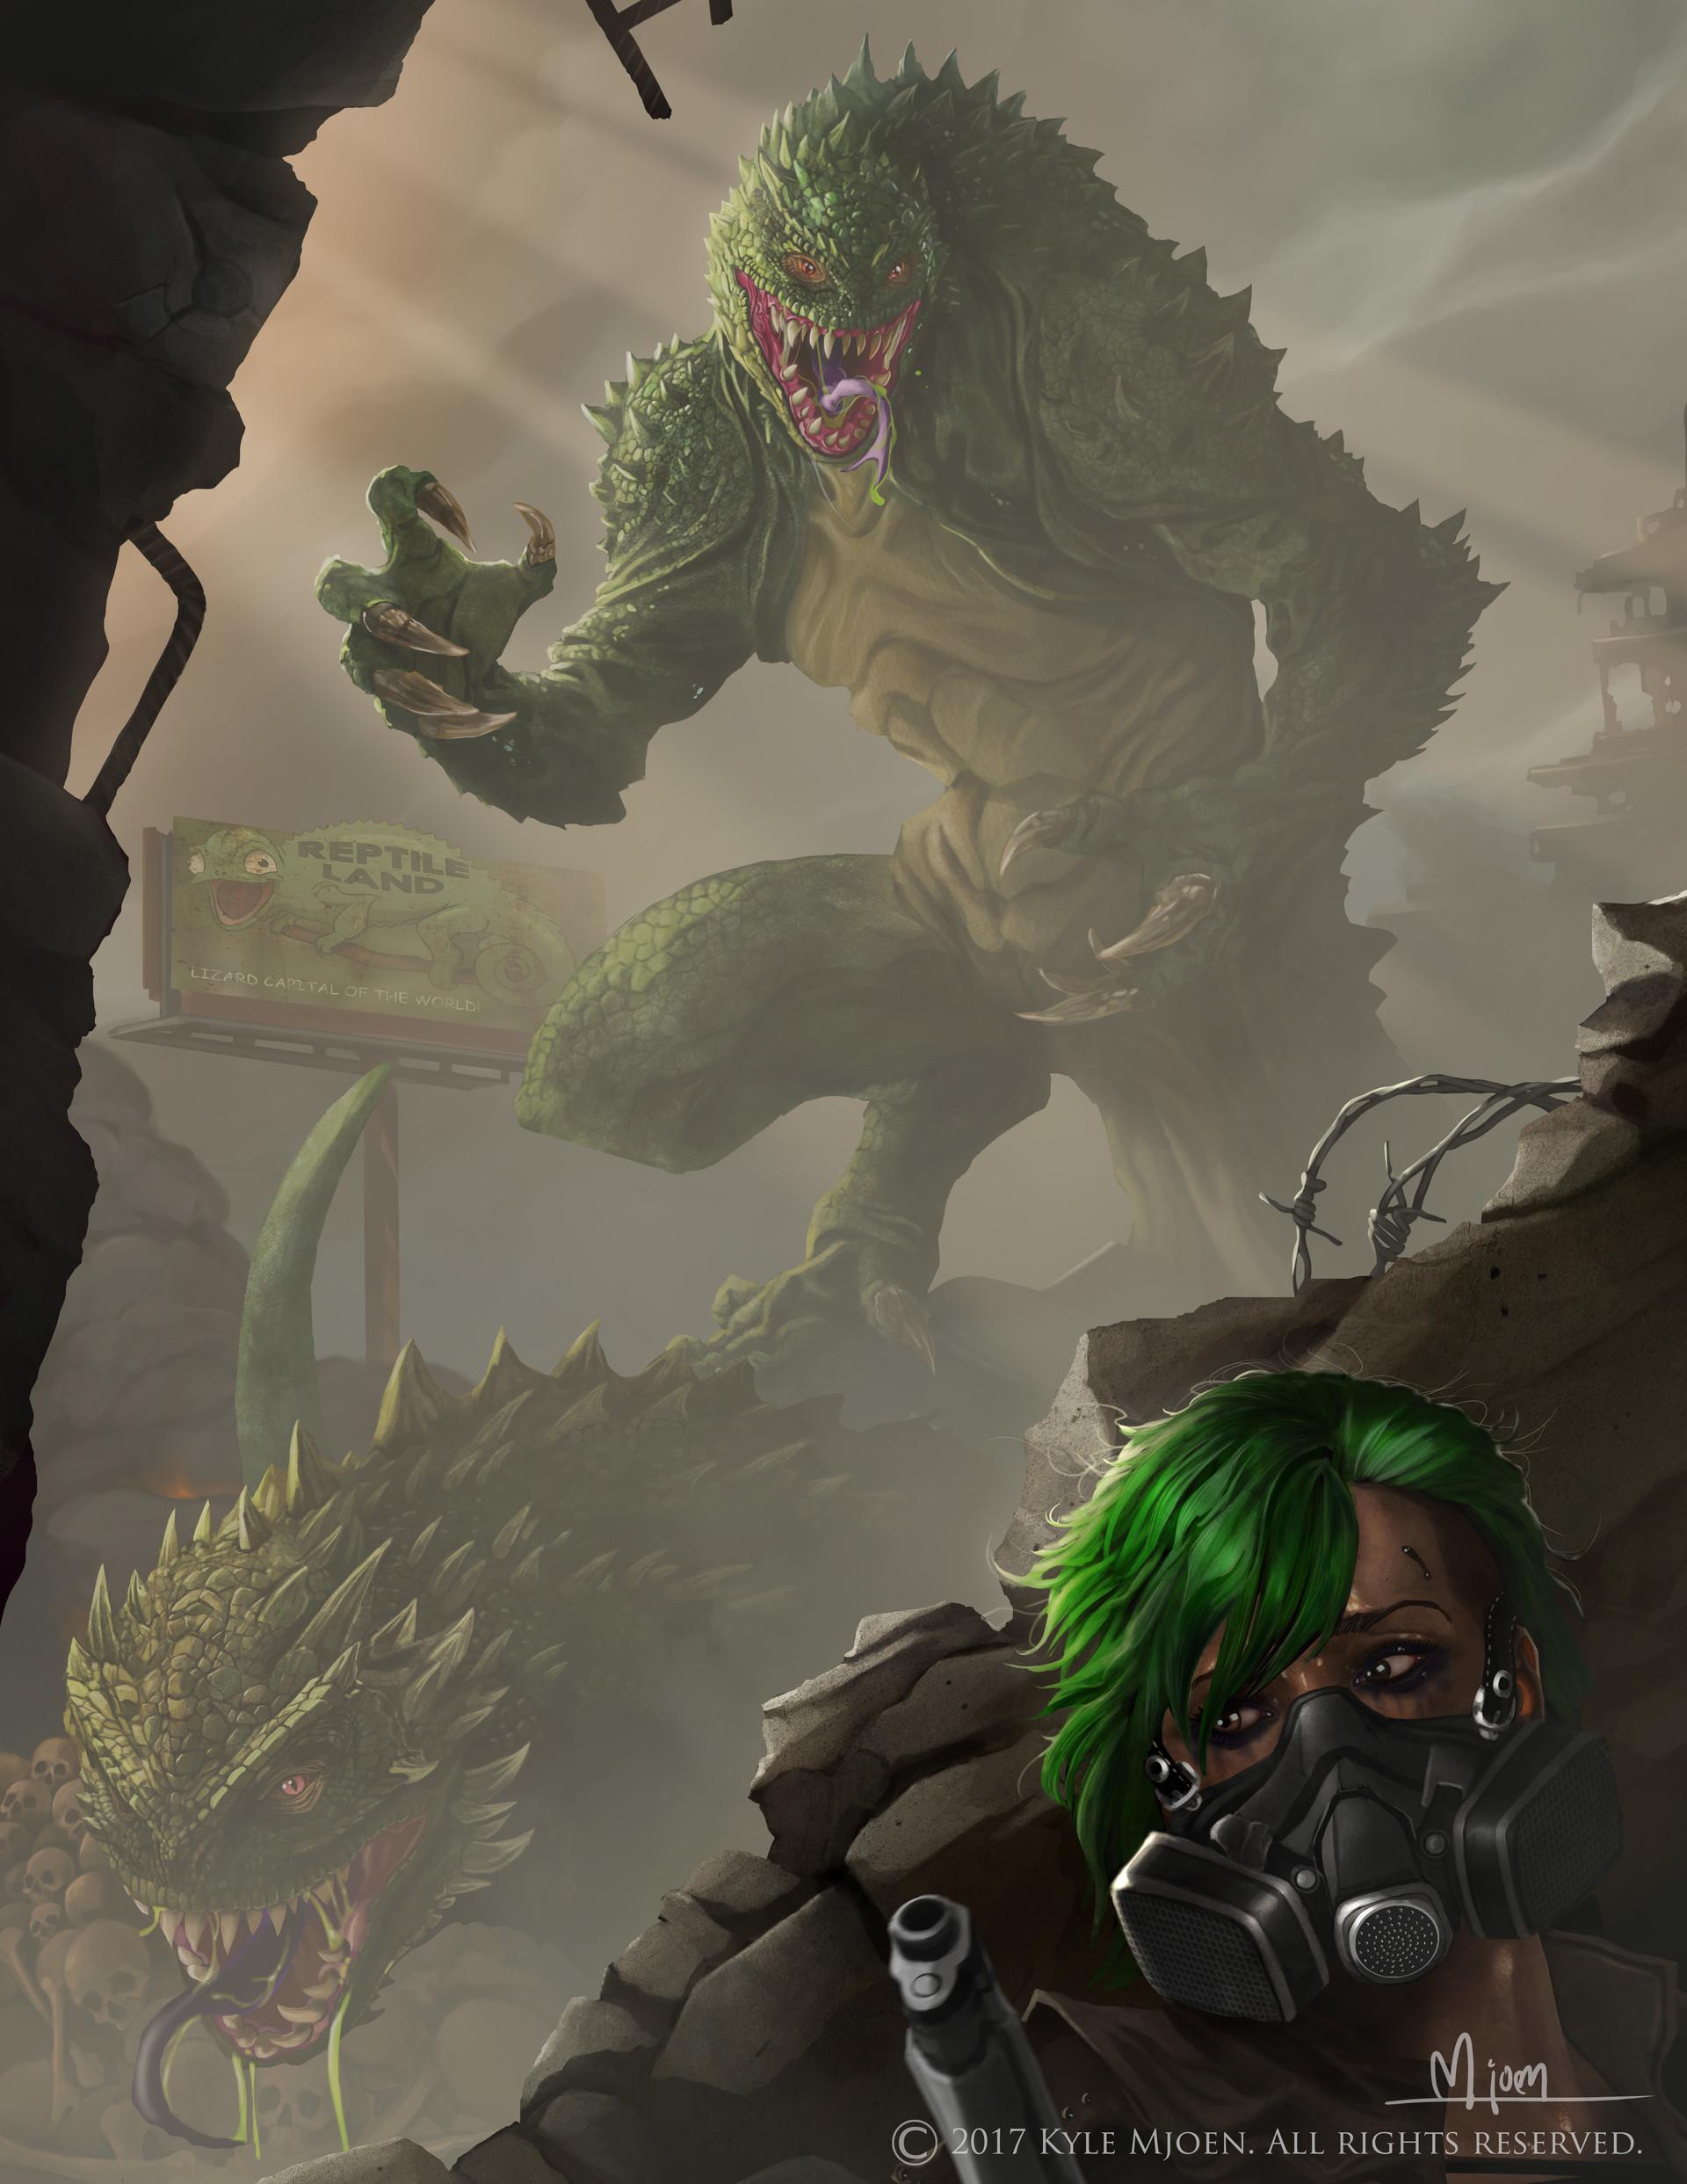 Kyle mjoen lizard mutants mjoen